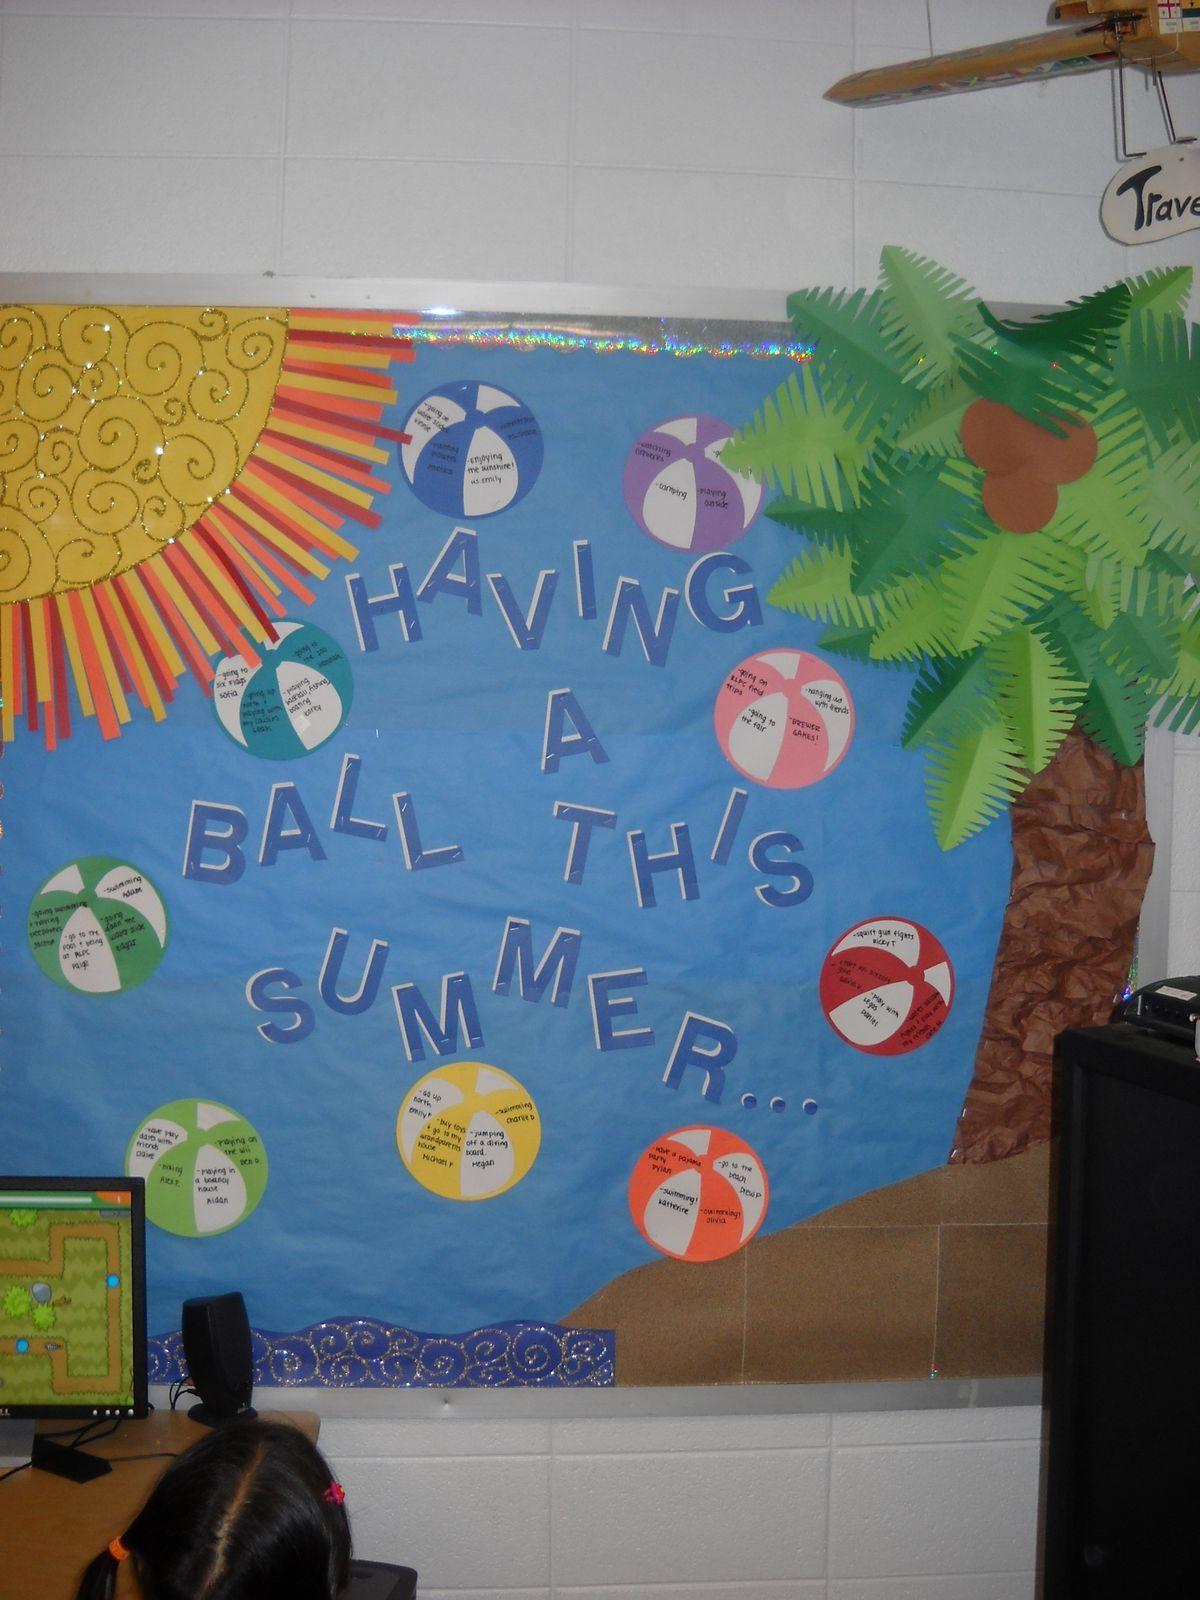 Having A Ball This Summer Classroom Bulletin Board Idea